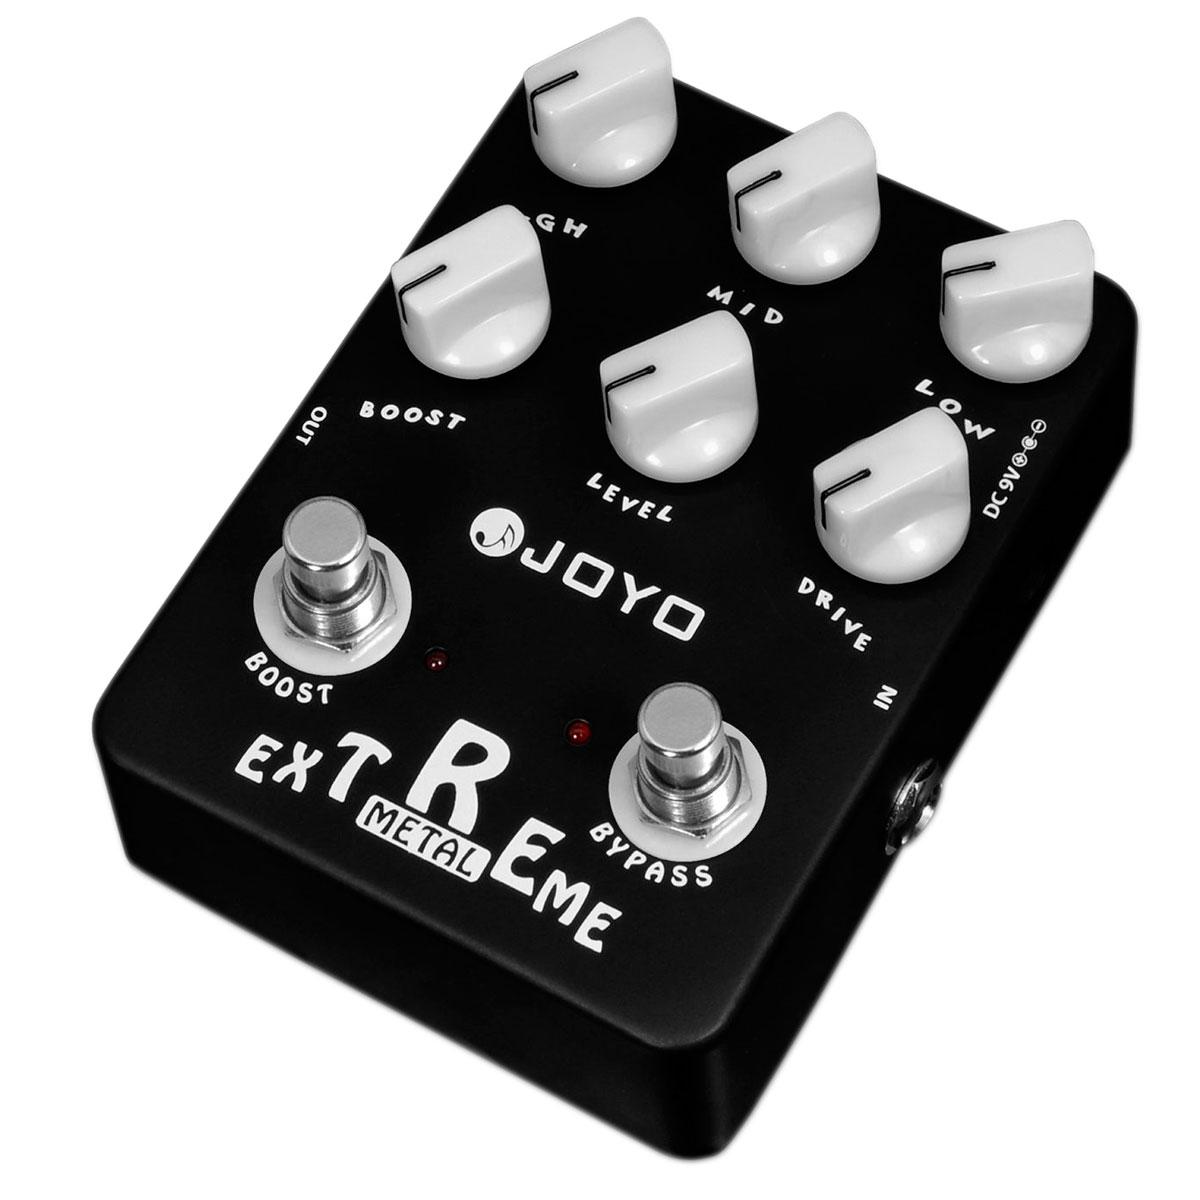 Pedal Emulador Extreme Metal p/ Guitarra - JF 17 Joyo